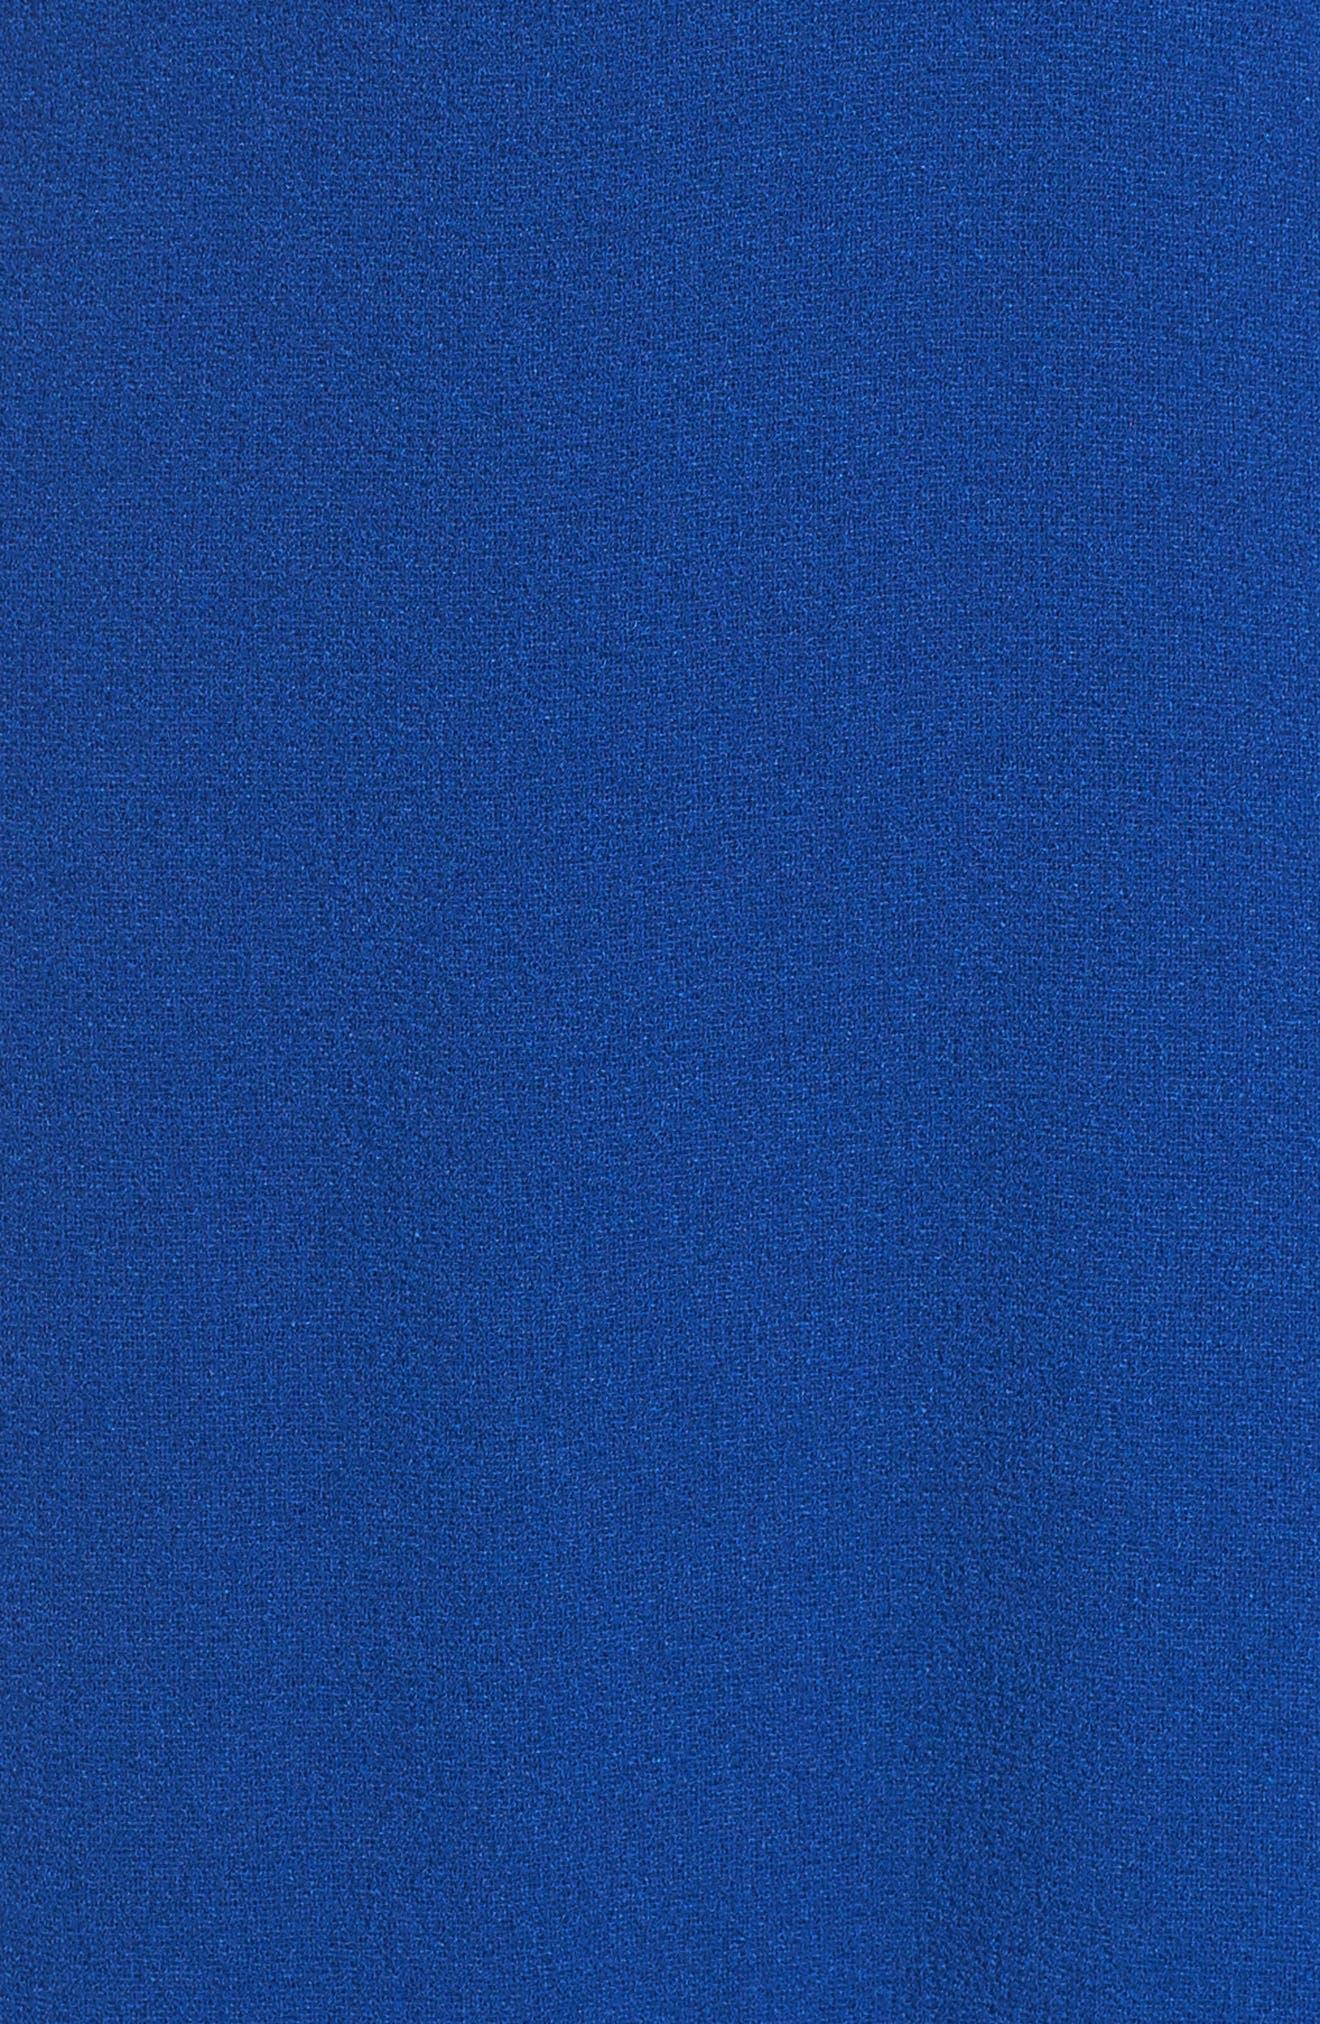 Stretch Crepe Blouson Halter Dress,                             Alternate thumbnail 5, color,                             494